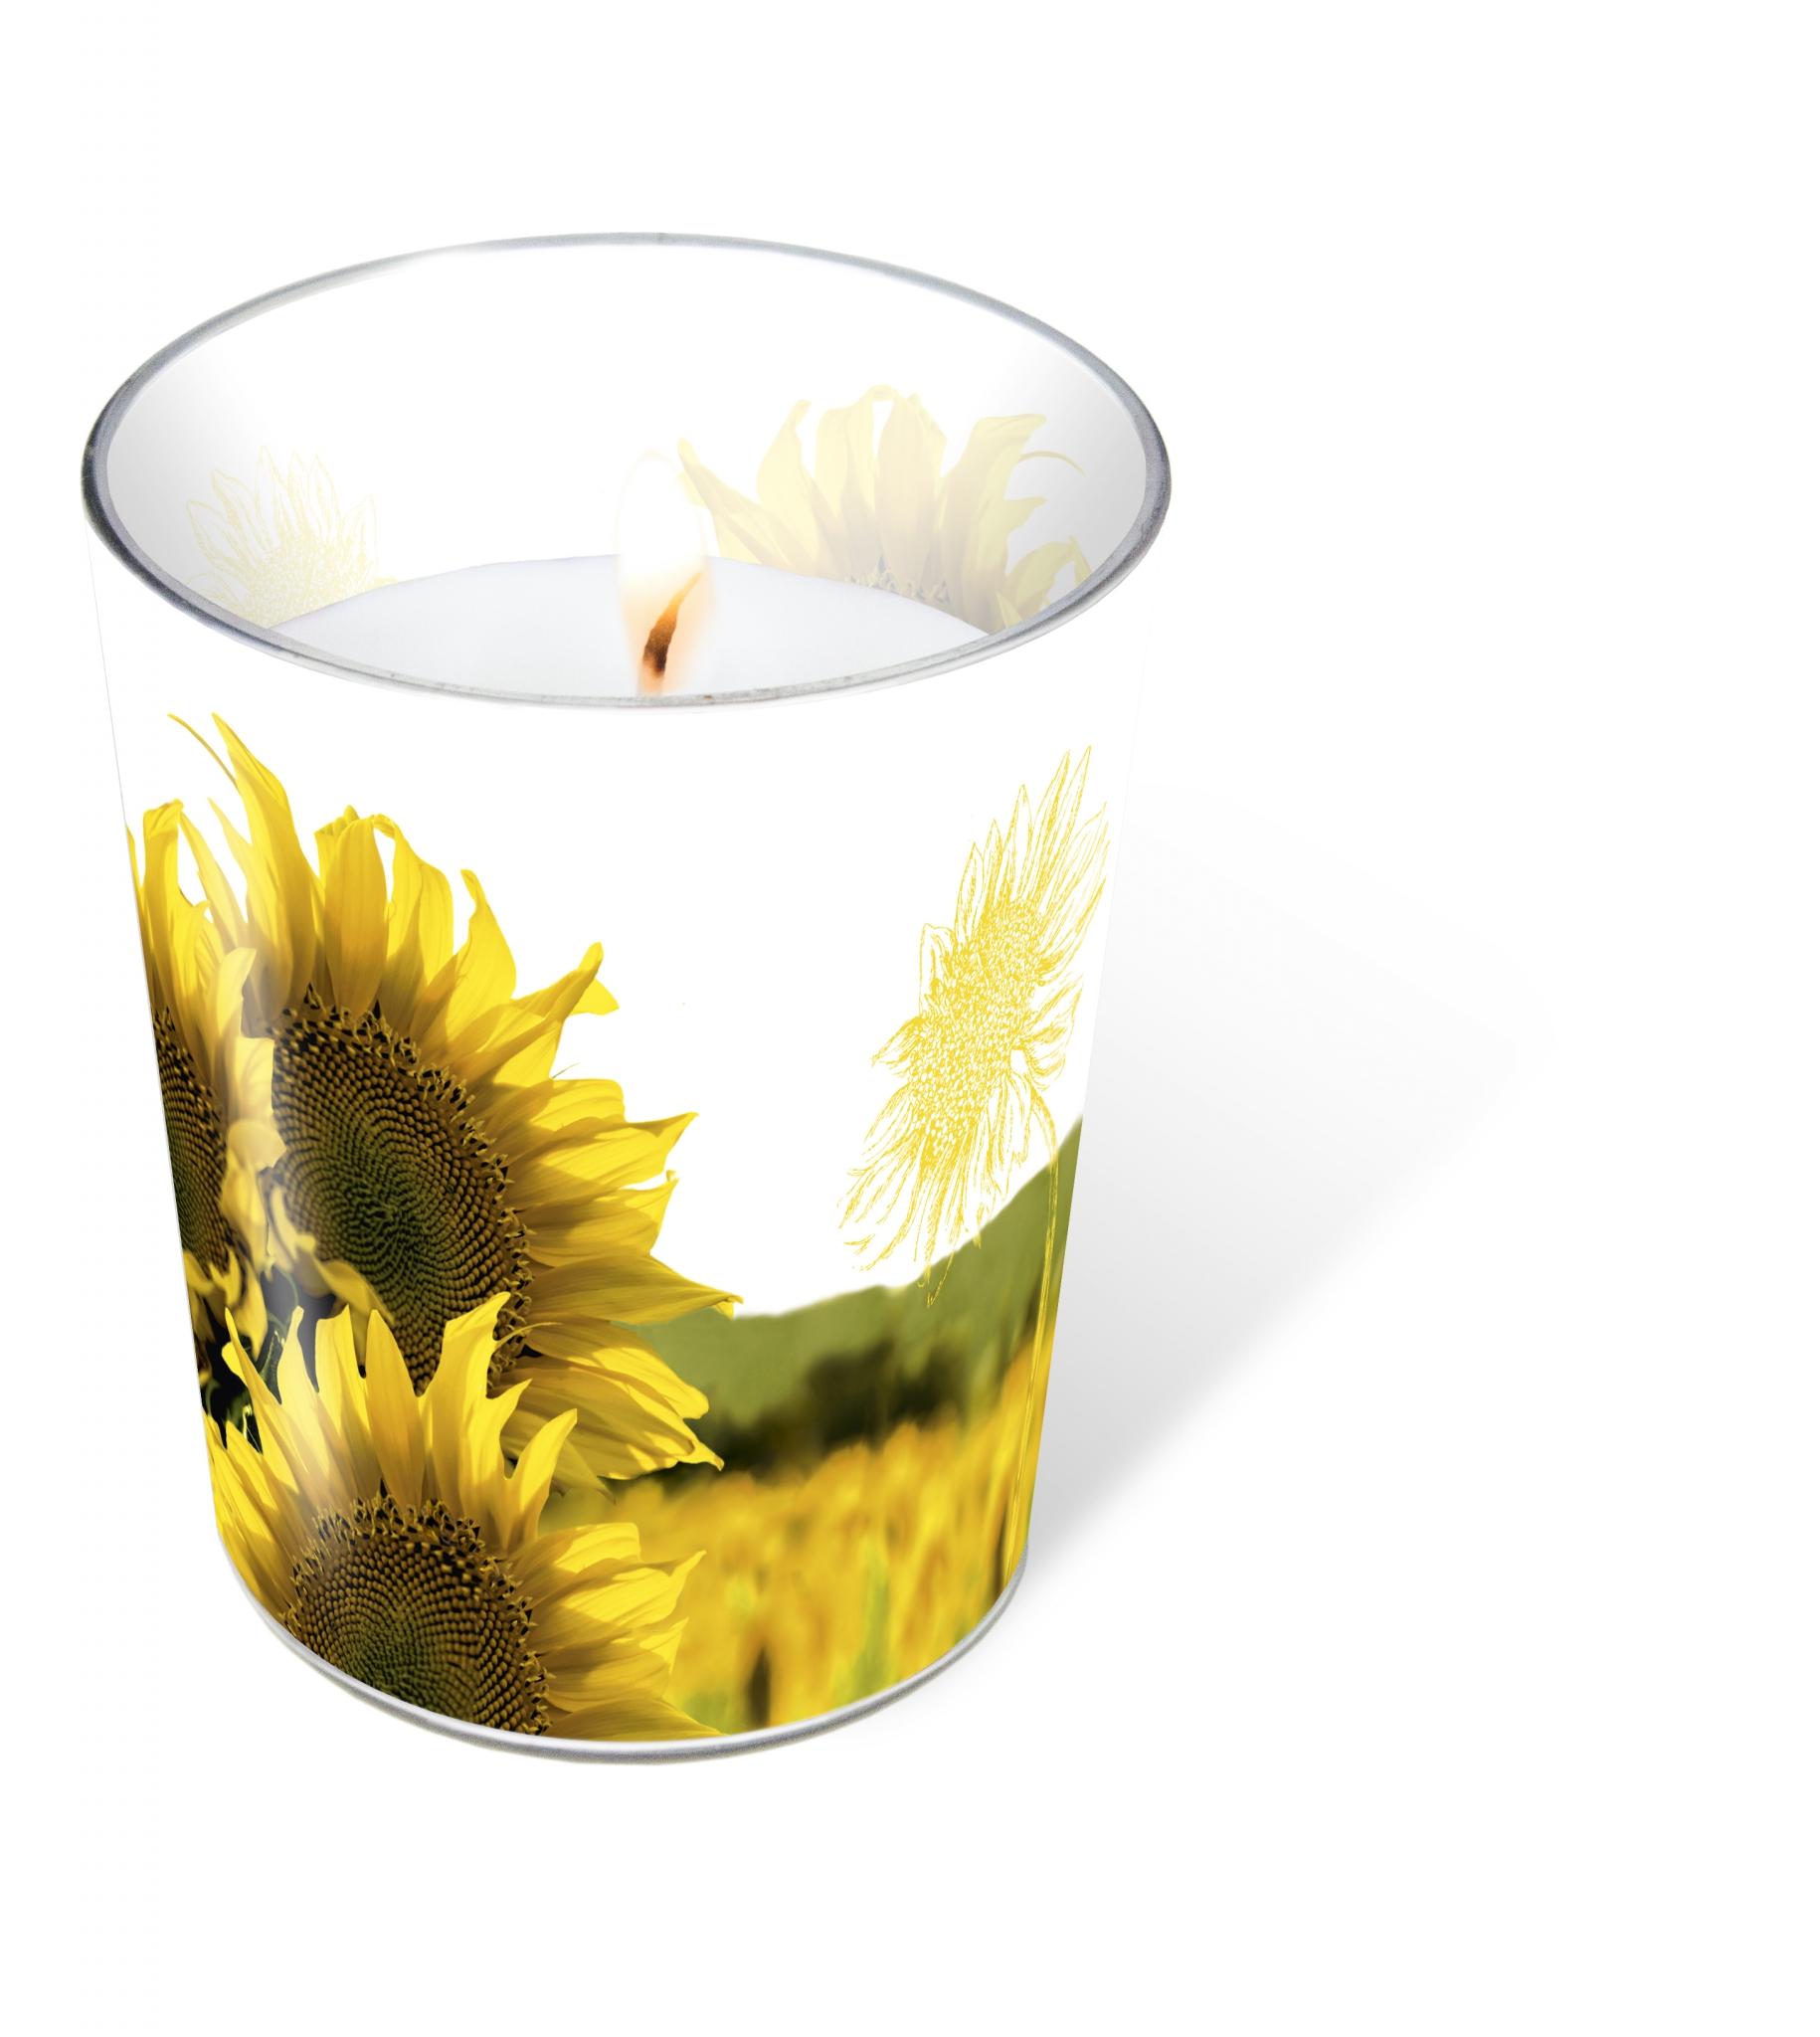 glass candle - Dusk Sunflower